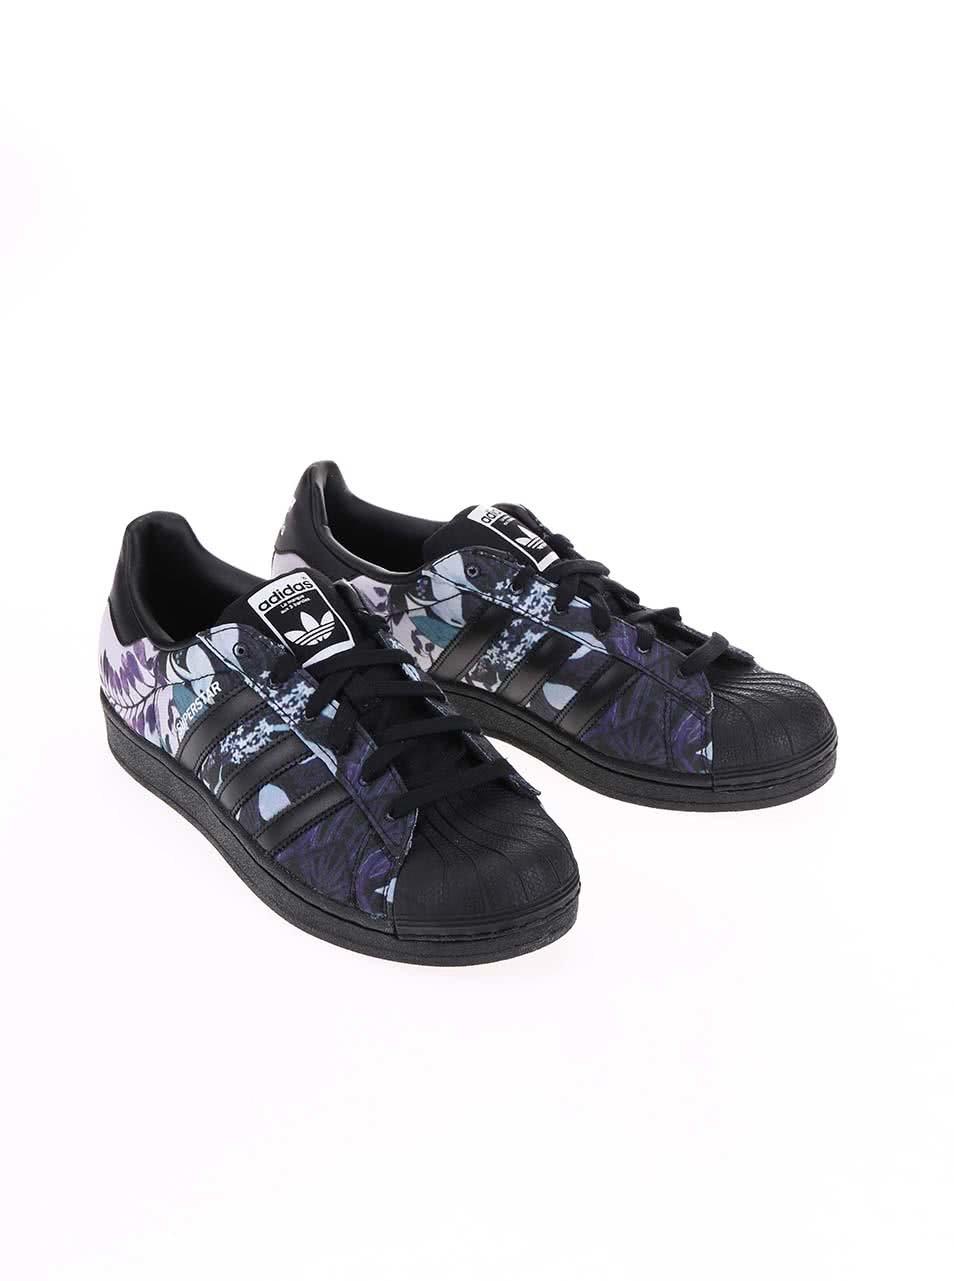 d0c6e711763b7 Čierne pánske tenisky adidas Originals Superstar W | ZOOT.sk